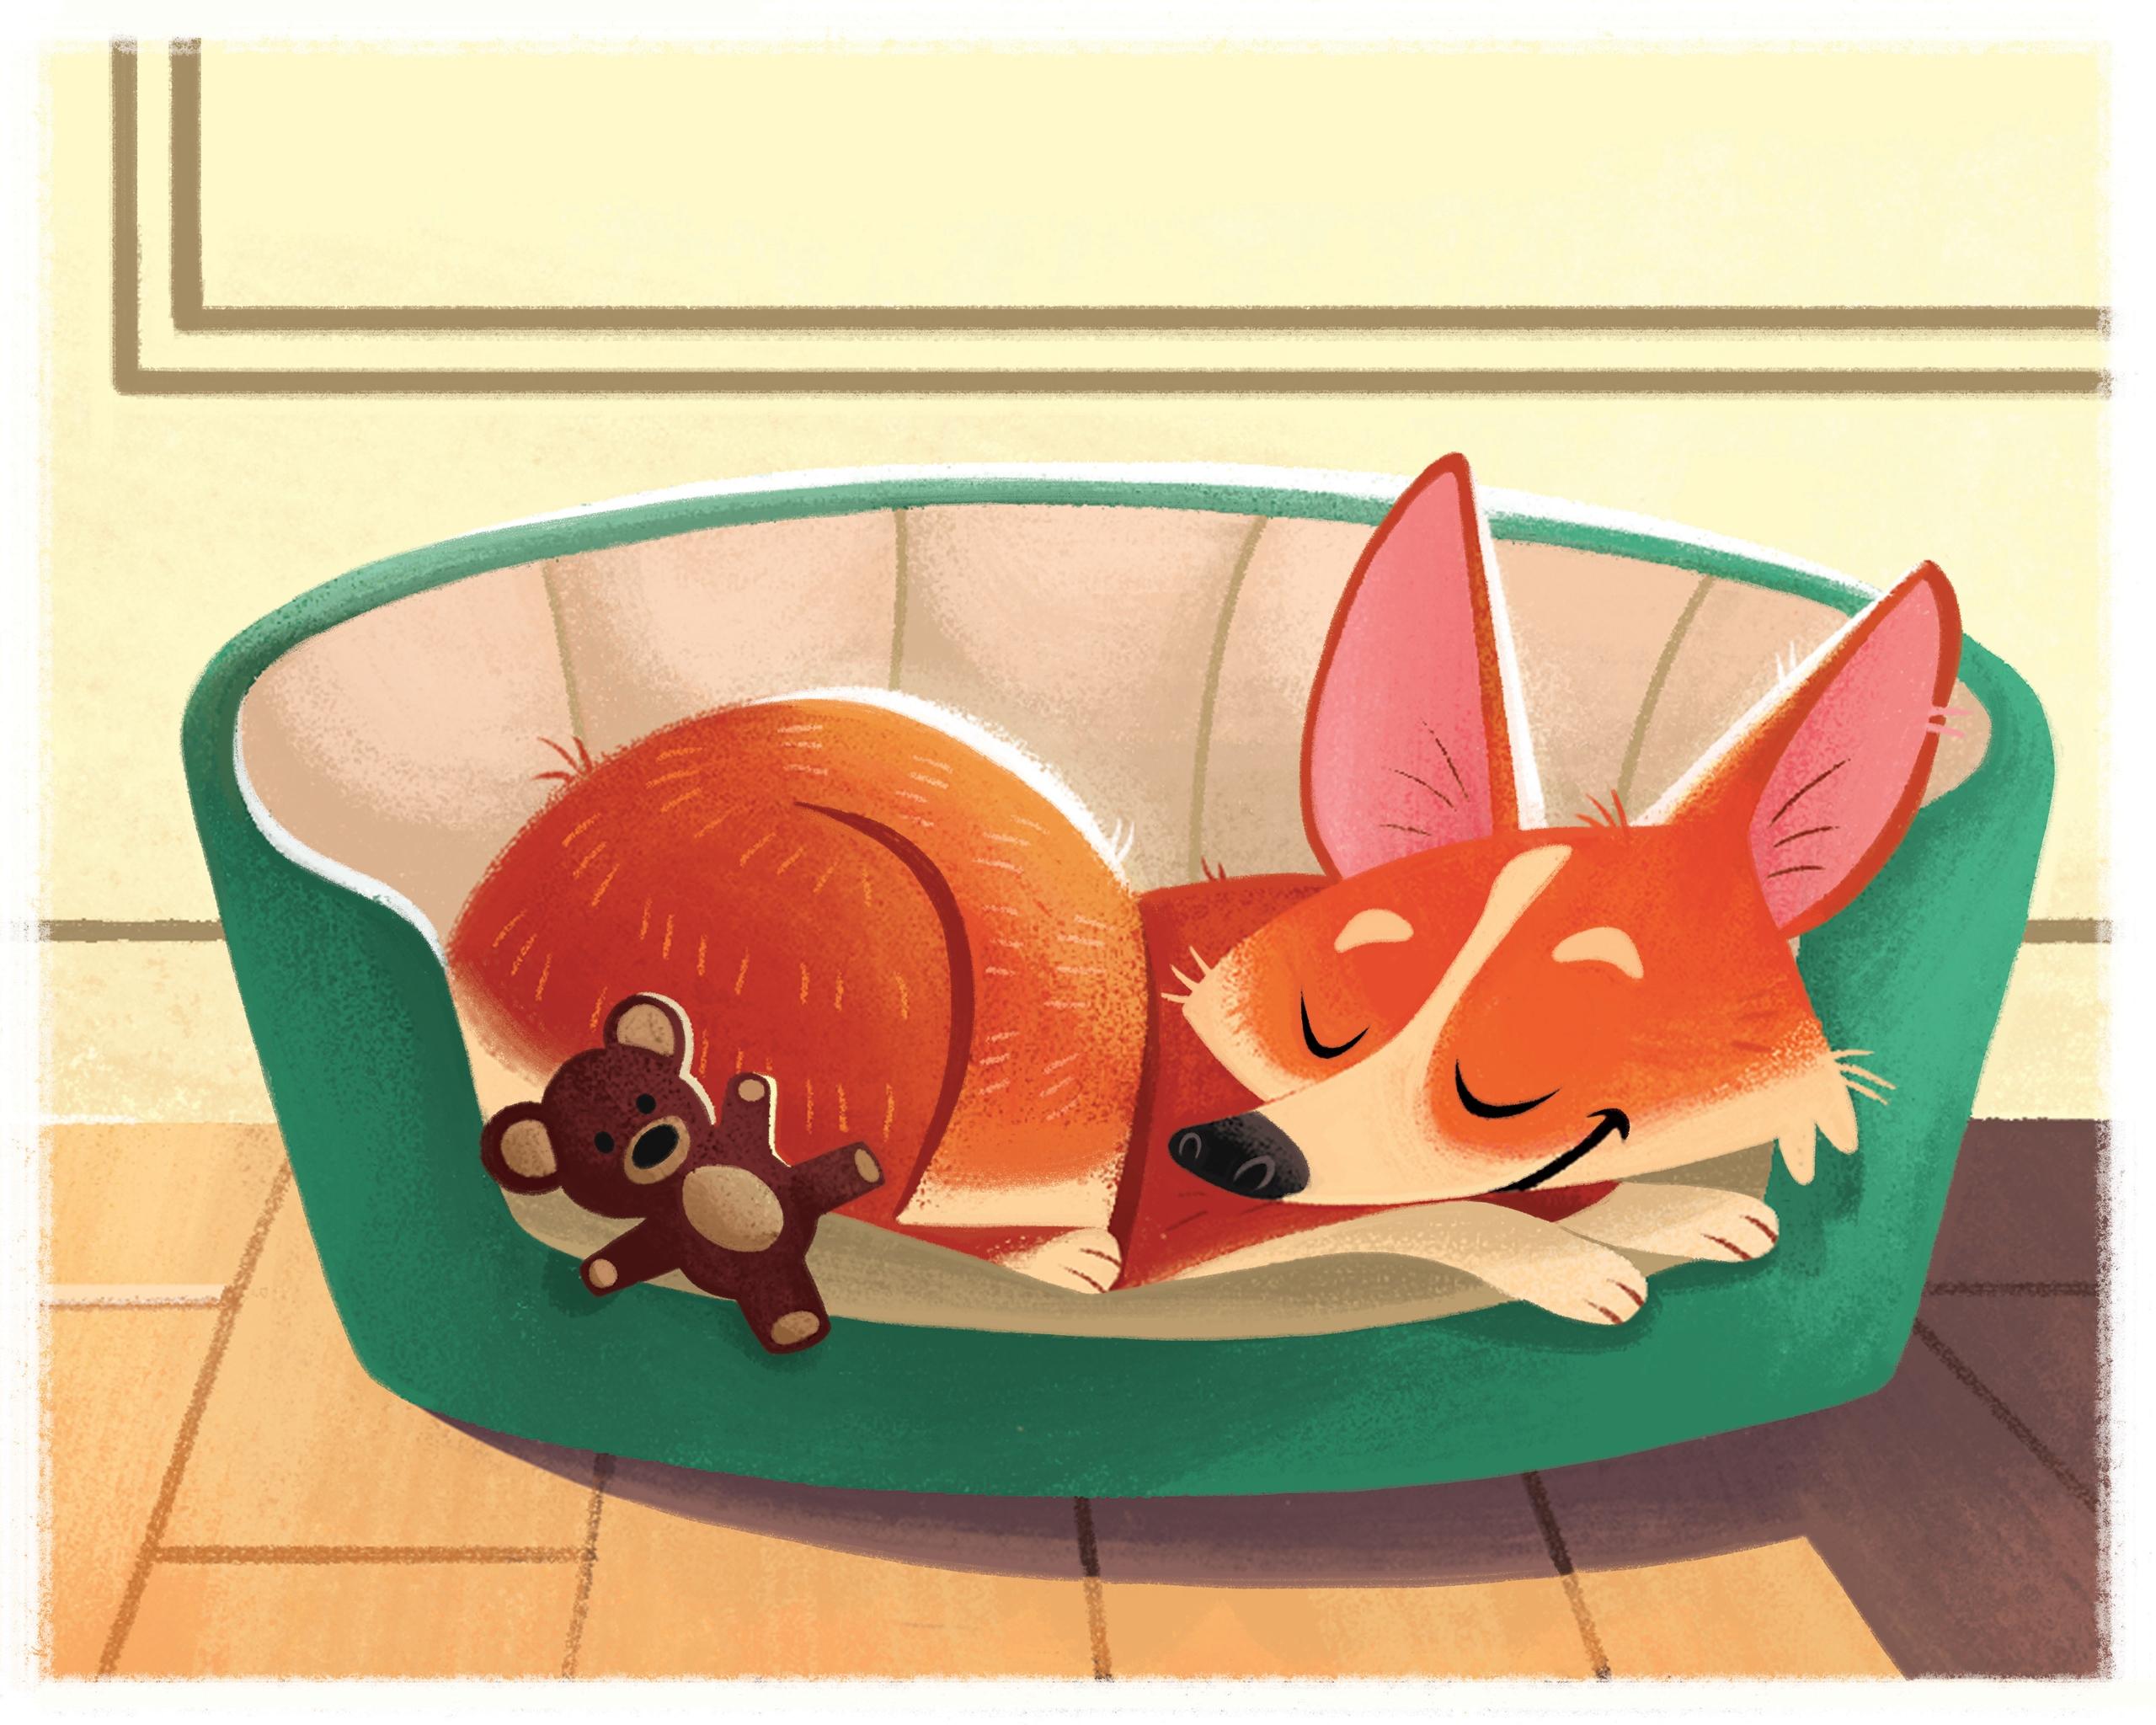 Sleepy corgi - dog, characterdesign - ashleyodell | ello